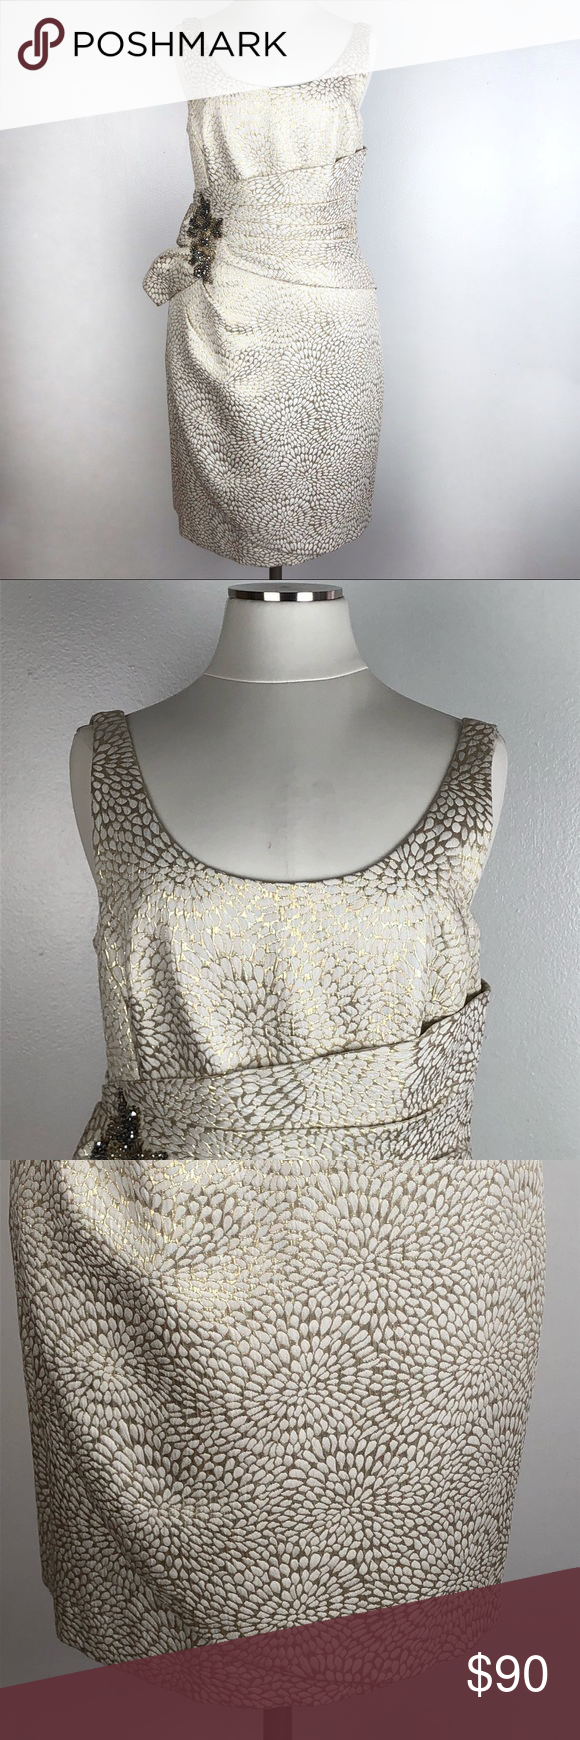 Kay unger dress metallic gold beaded formal d in my posh